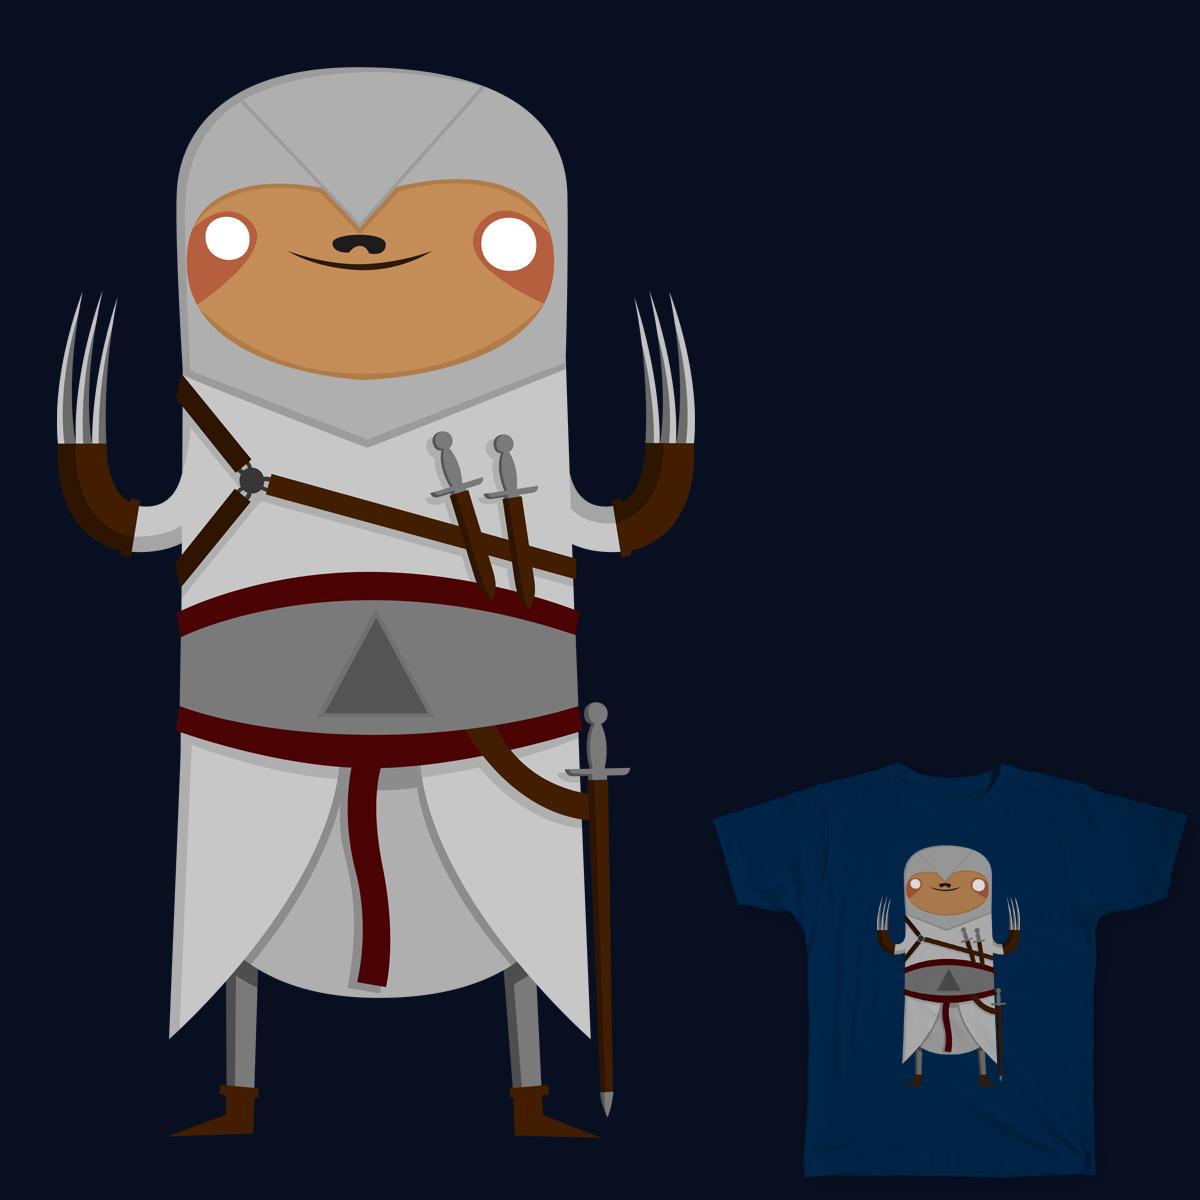 Assassin Sloth by BakusPT on Threadless